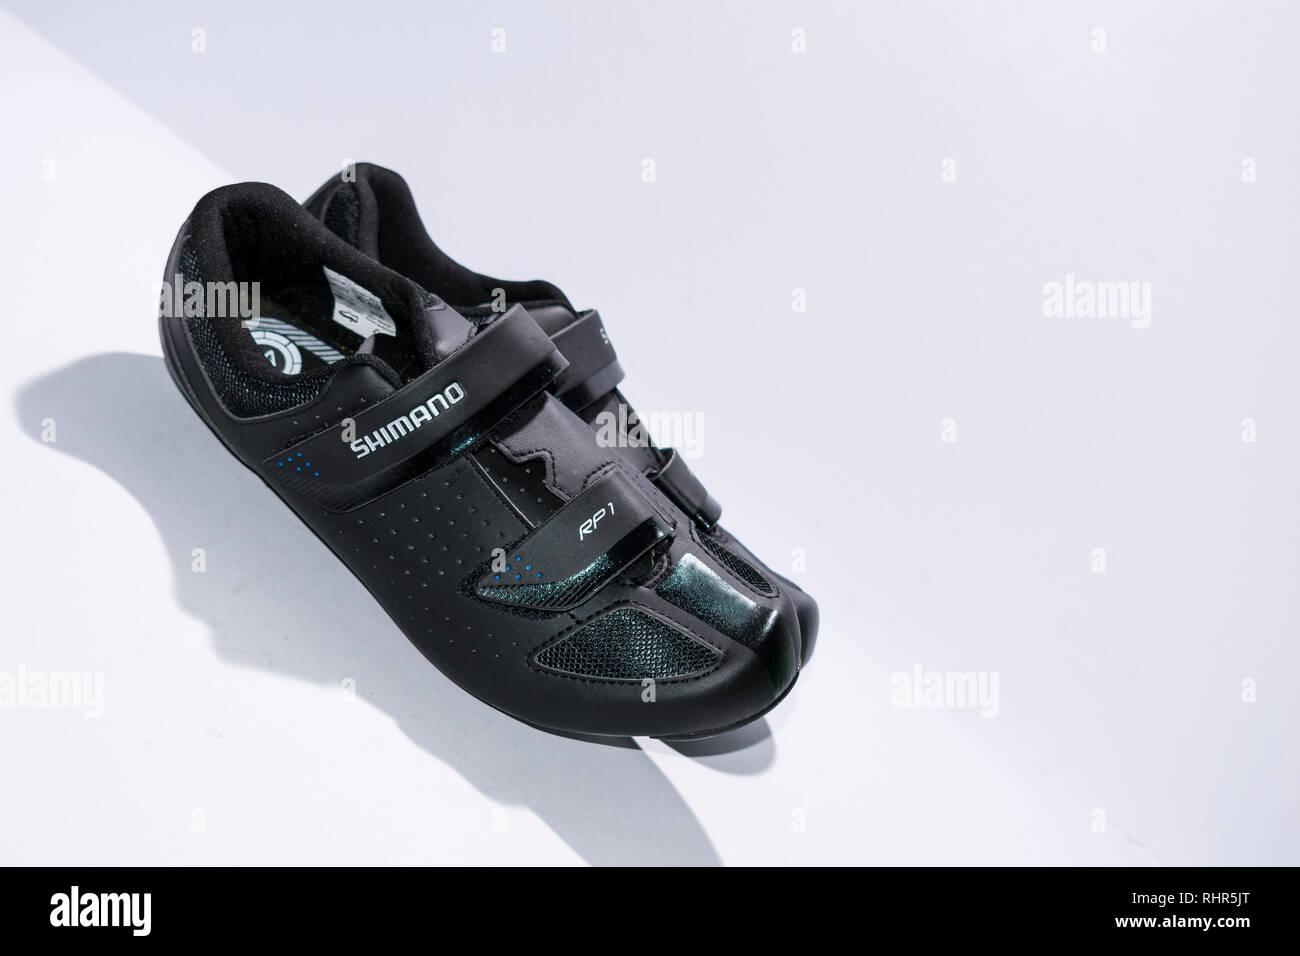 Shimano RP1 Cycling shoes - Stock Image